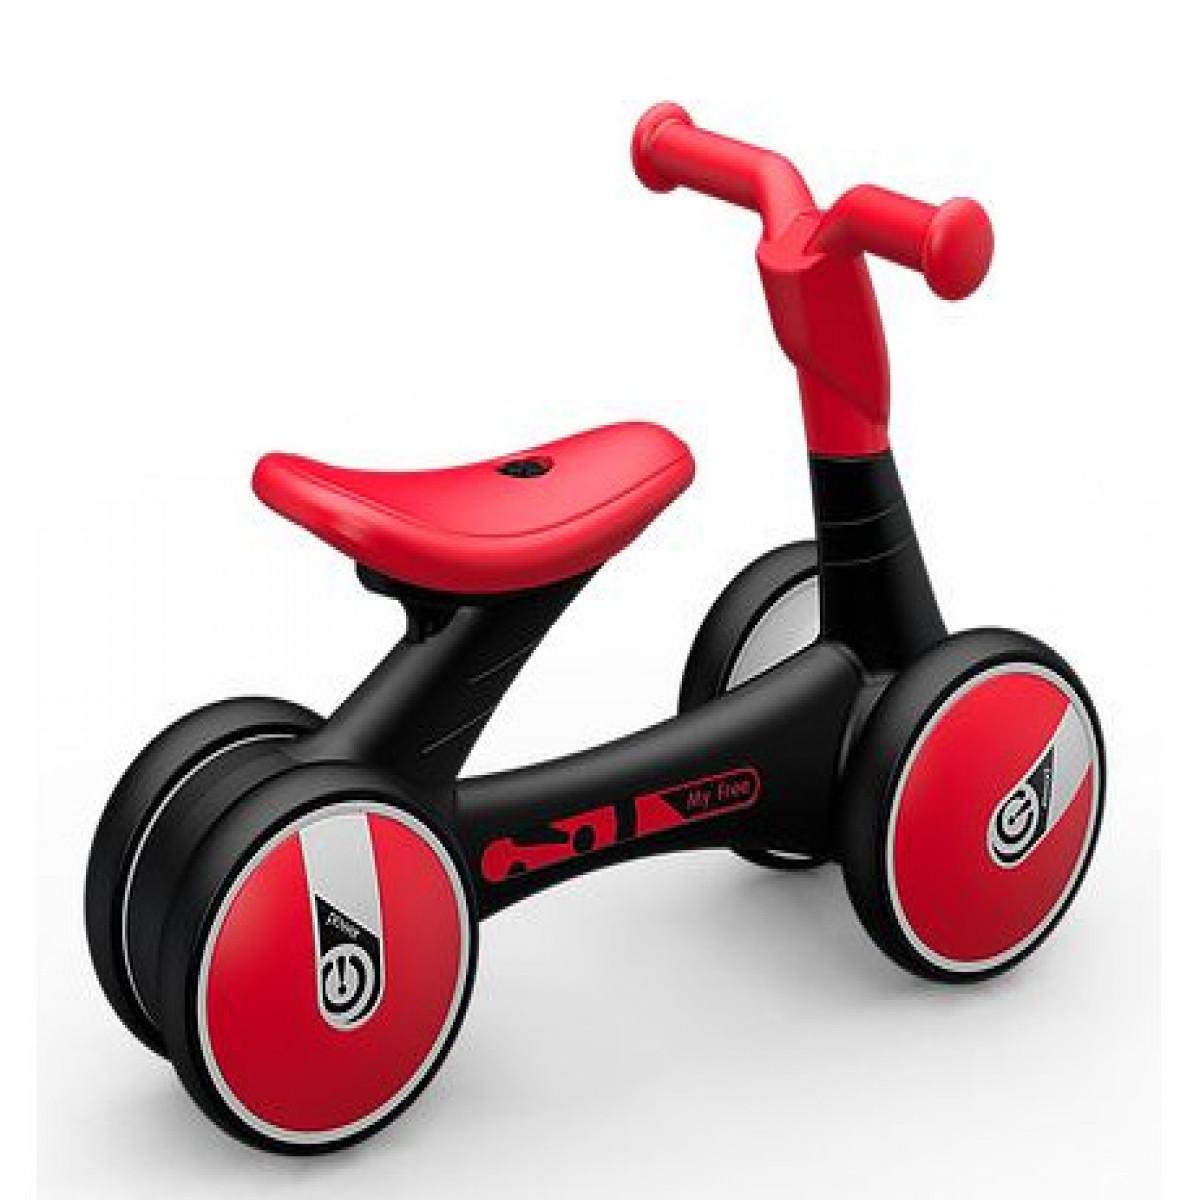 Bici de arrastre 18 a 36m Tiovivo rojo